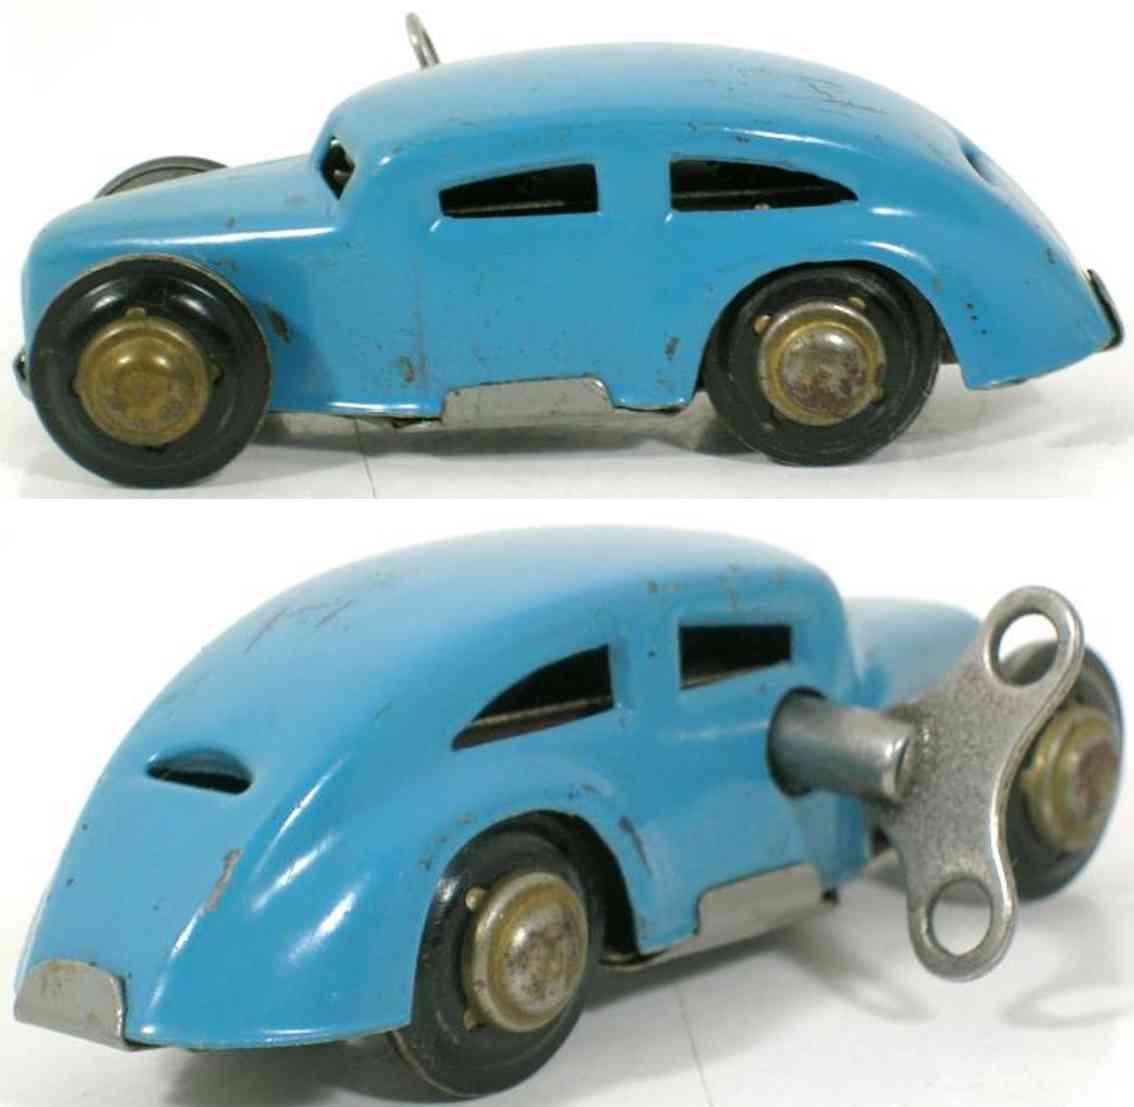 kellermann 363 blech spielzeug miniatur-auto blau uhrwerk